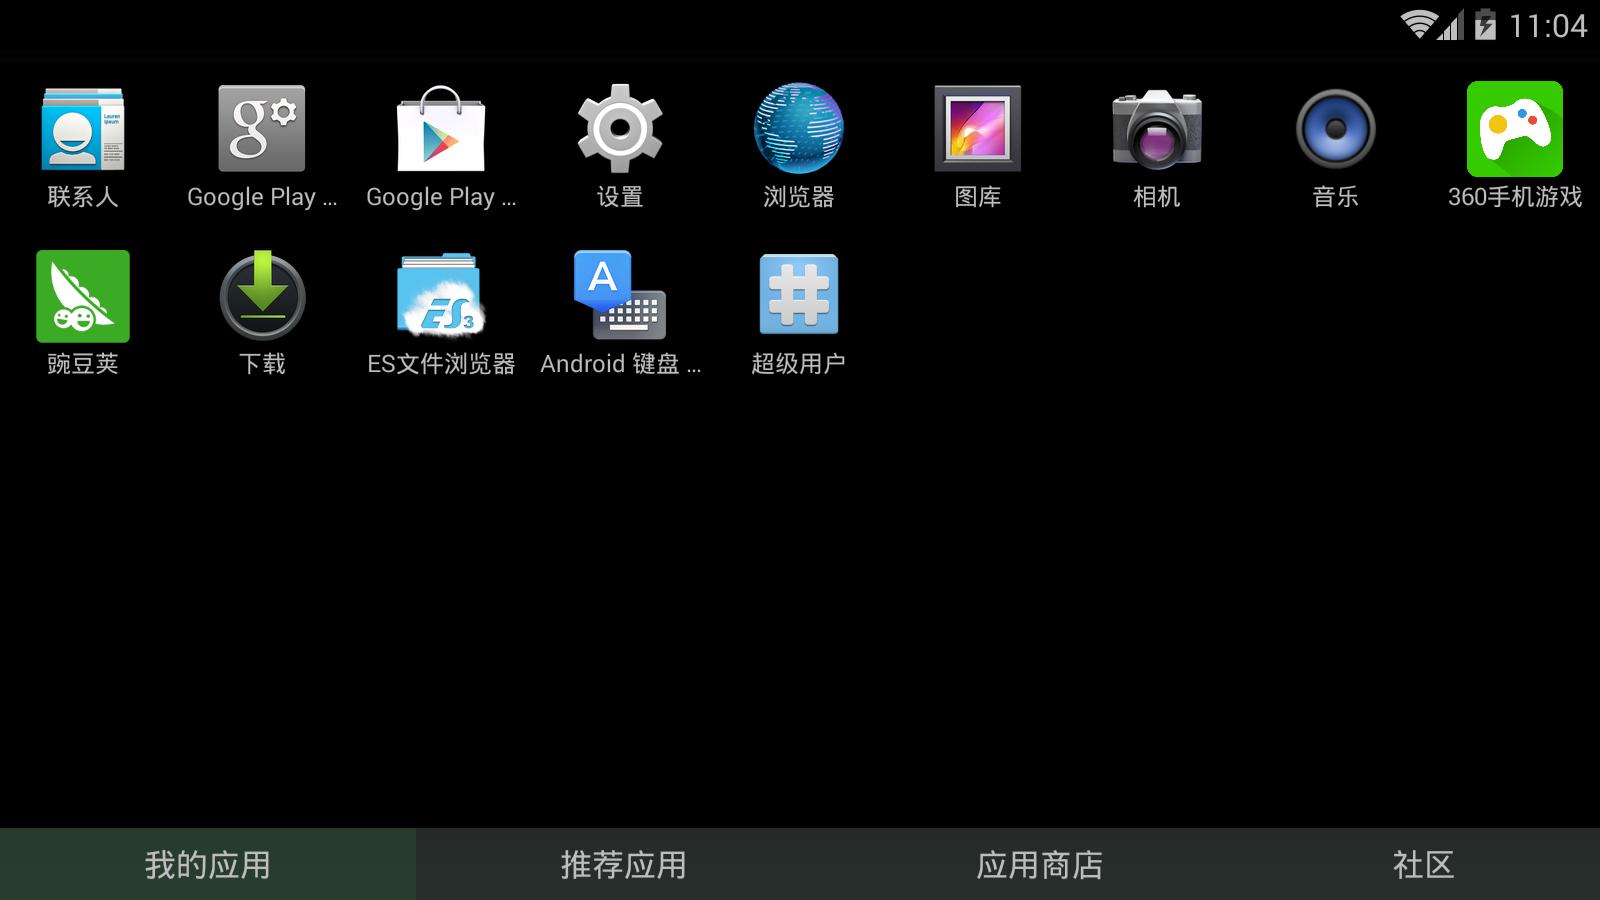 windroye-screenshot-1425351868.png